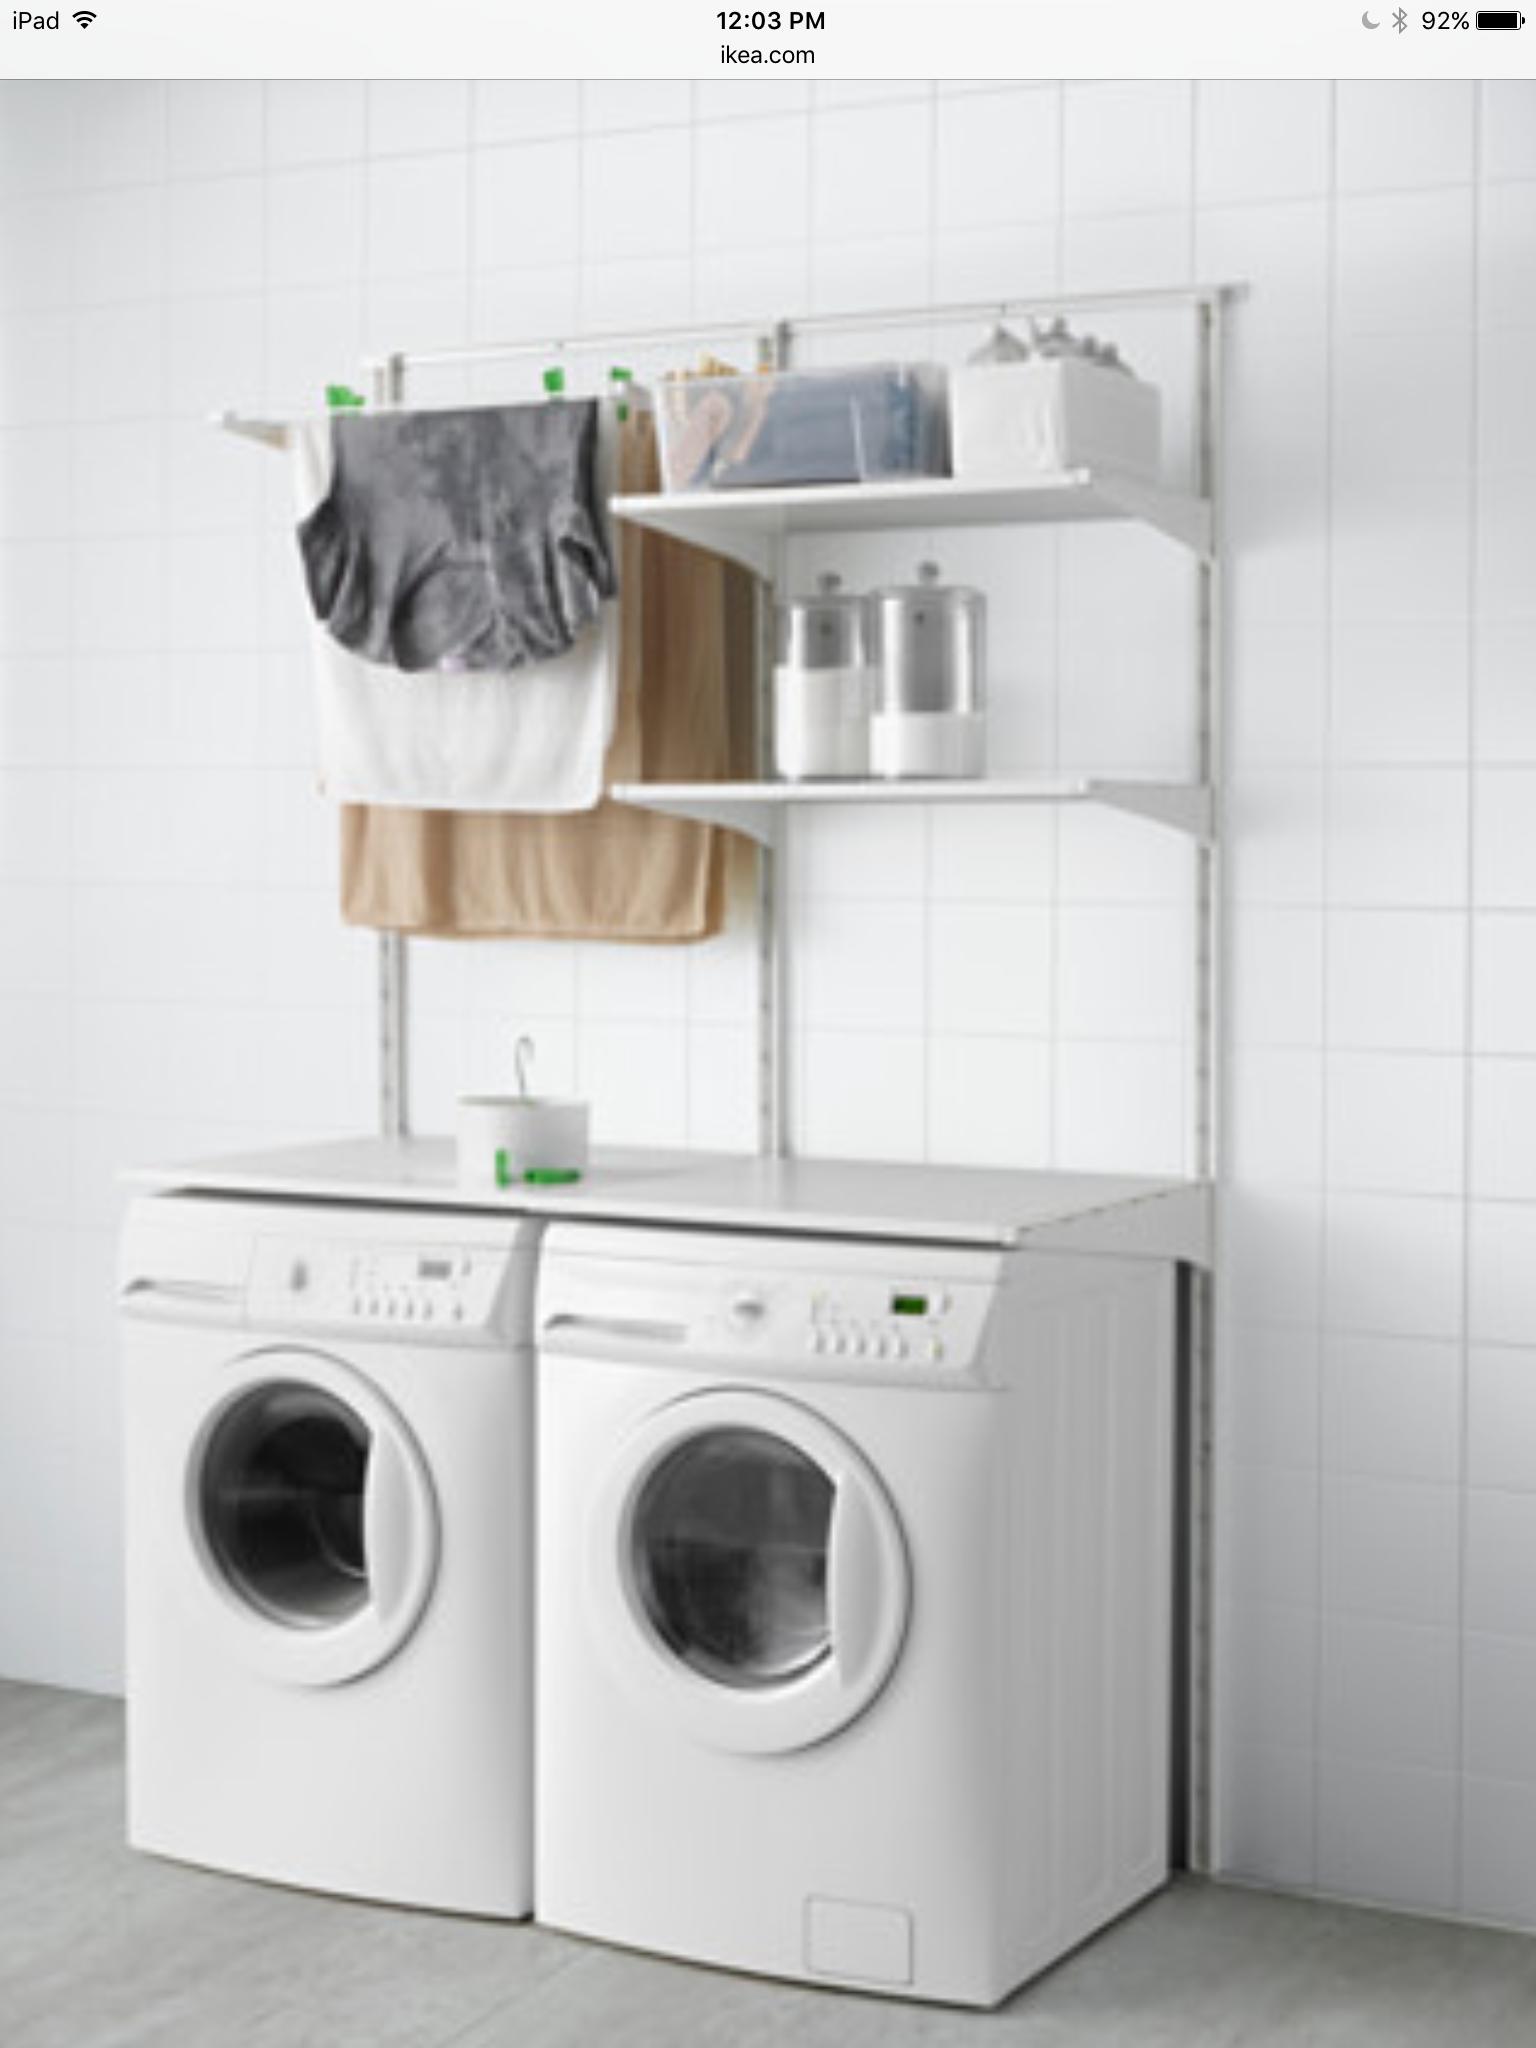 Grunthal drying rack from Ikea Bathroom Pinterest